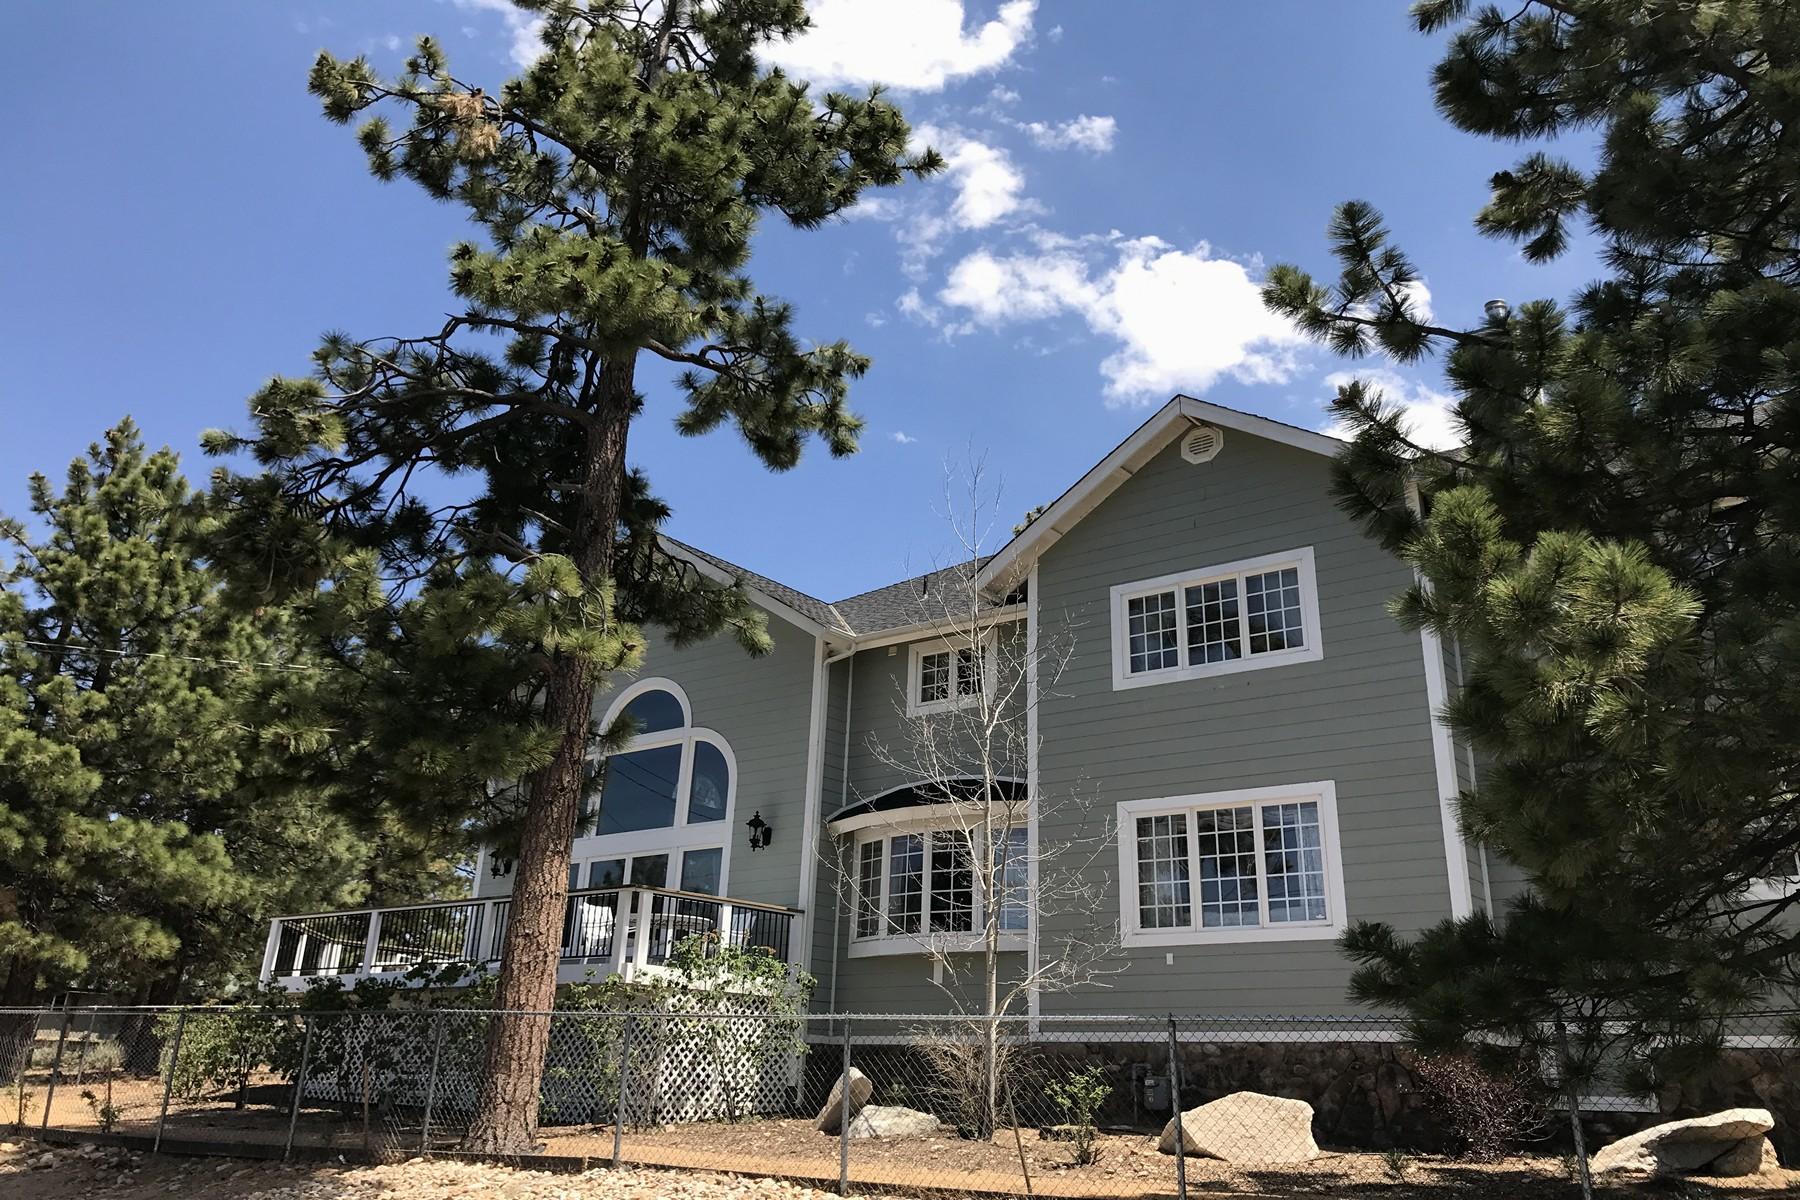 Propriété à vendre Big Bear Lake